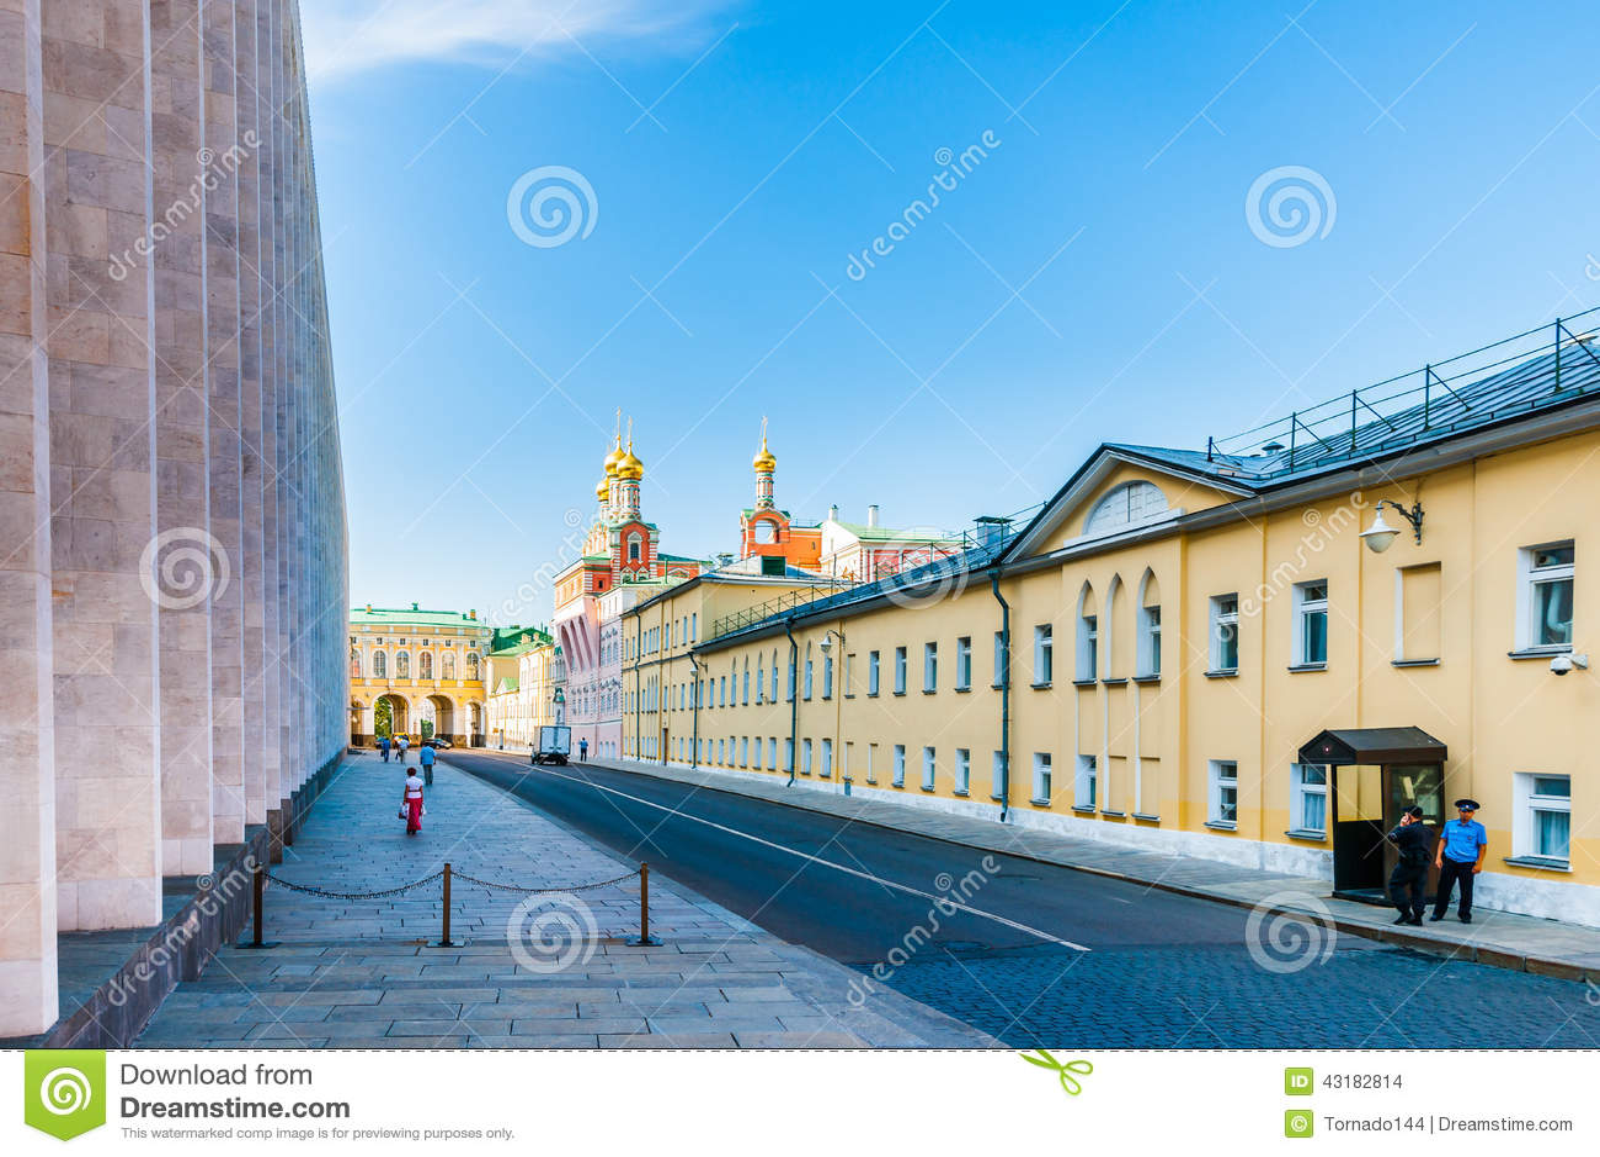 Reis 8 van het Kremlin: Niet-openbaar gebied van het Kremlin